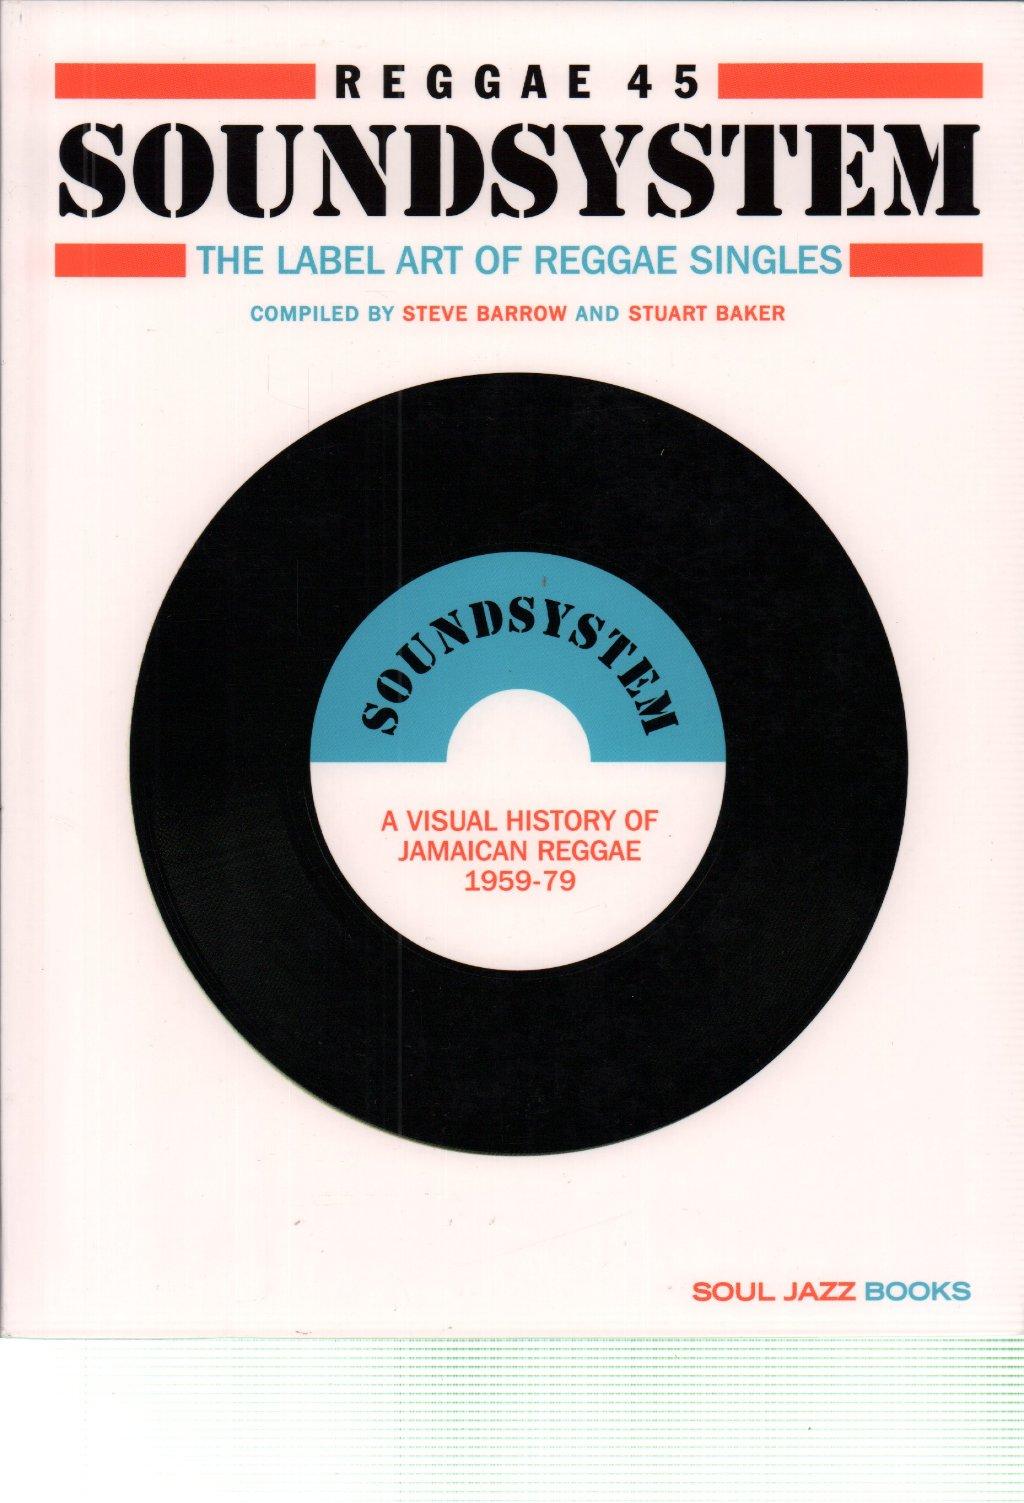 REGGAE 45 SOUNDSYSTEM: THE LABEL ART OF REGGAE SIN - A Visual History of Jamaican Reggae 1959-79 - Book